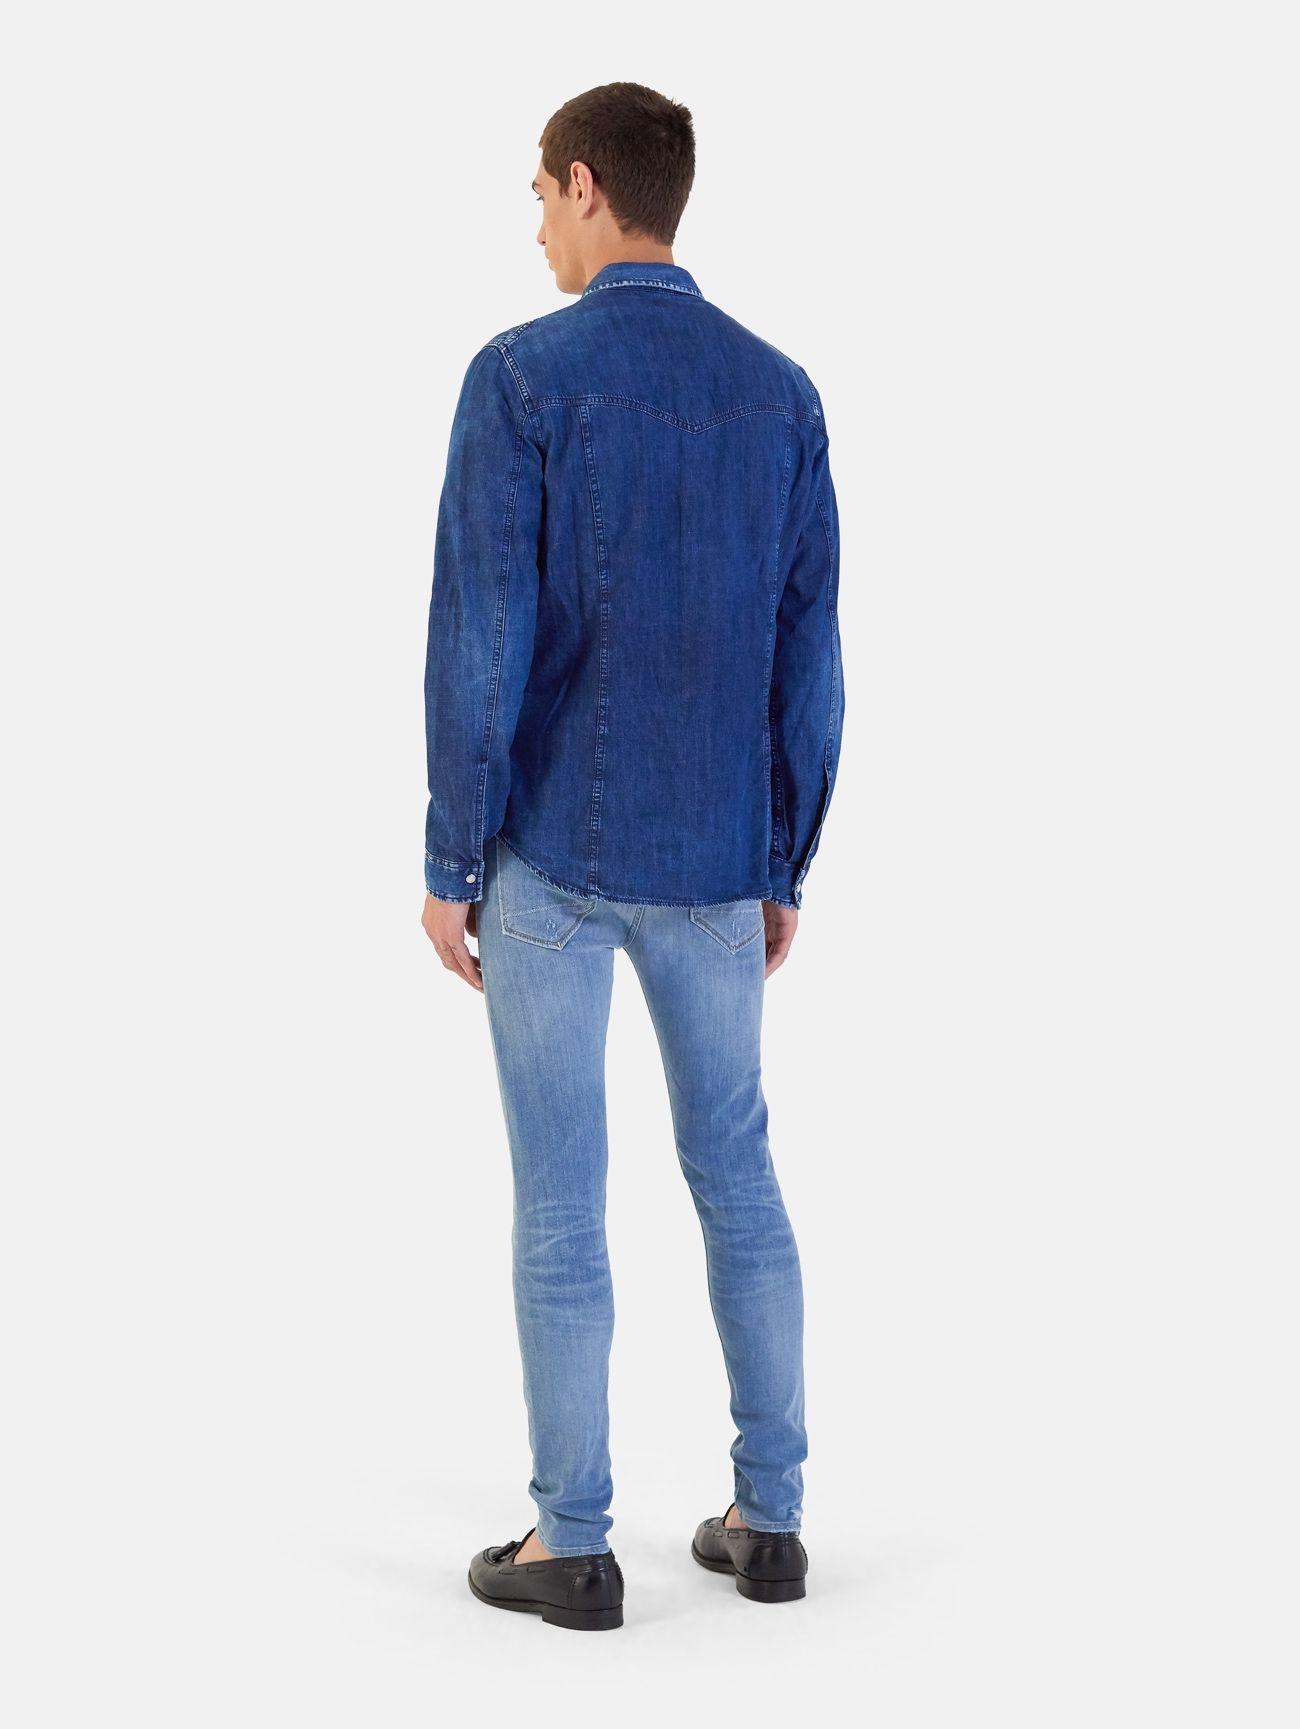 TRUCK ICON SHIRT POMICE STONE WASH NAVY BLUE